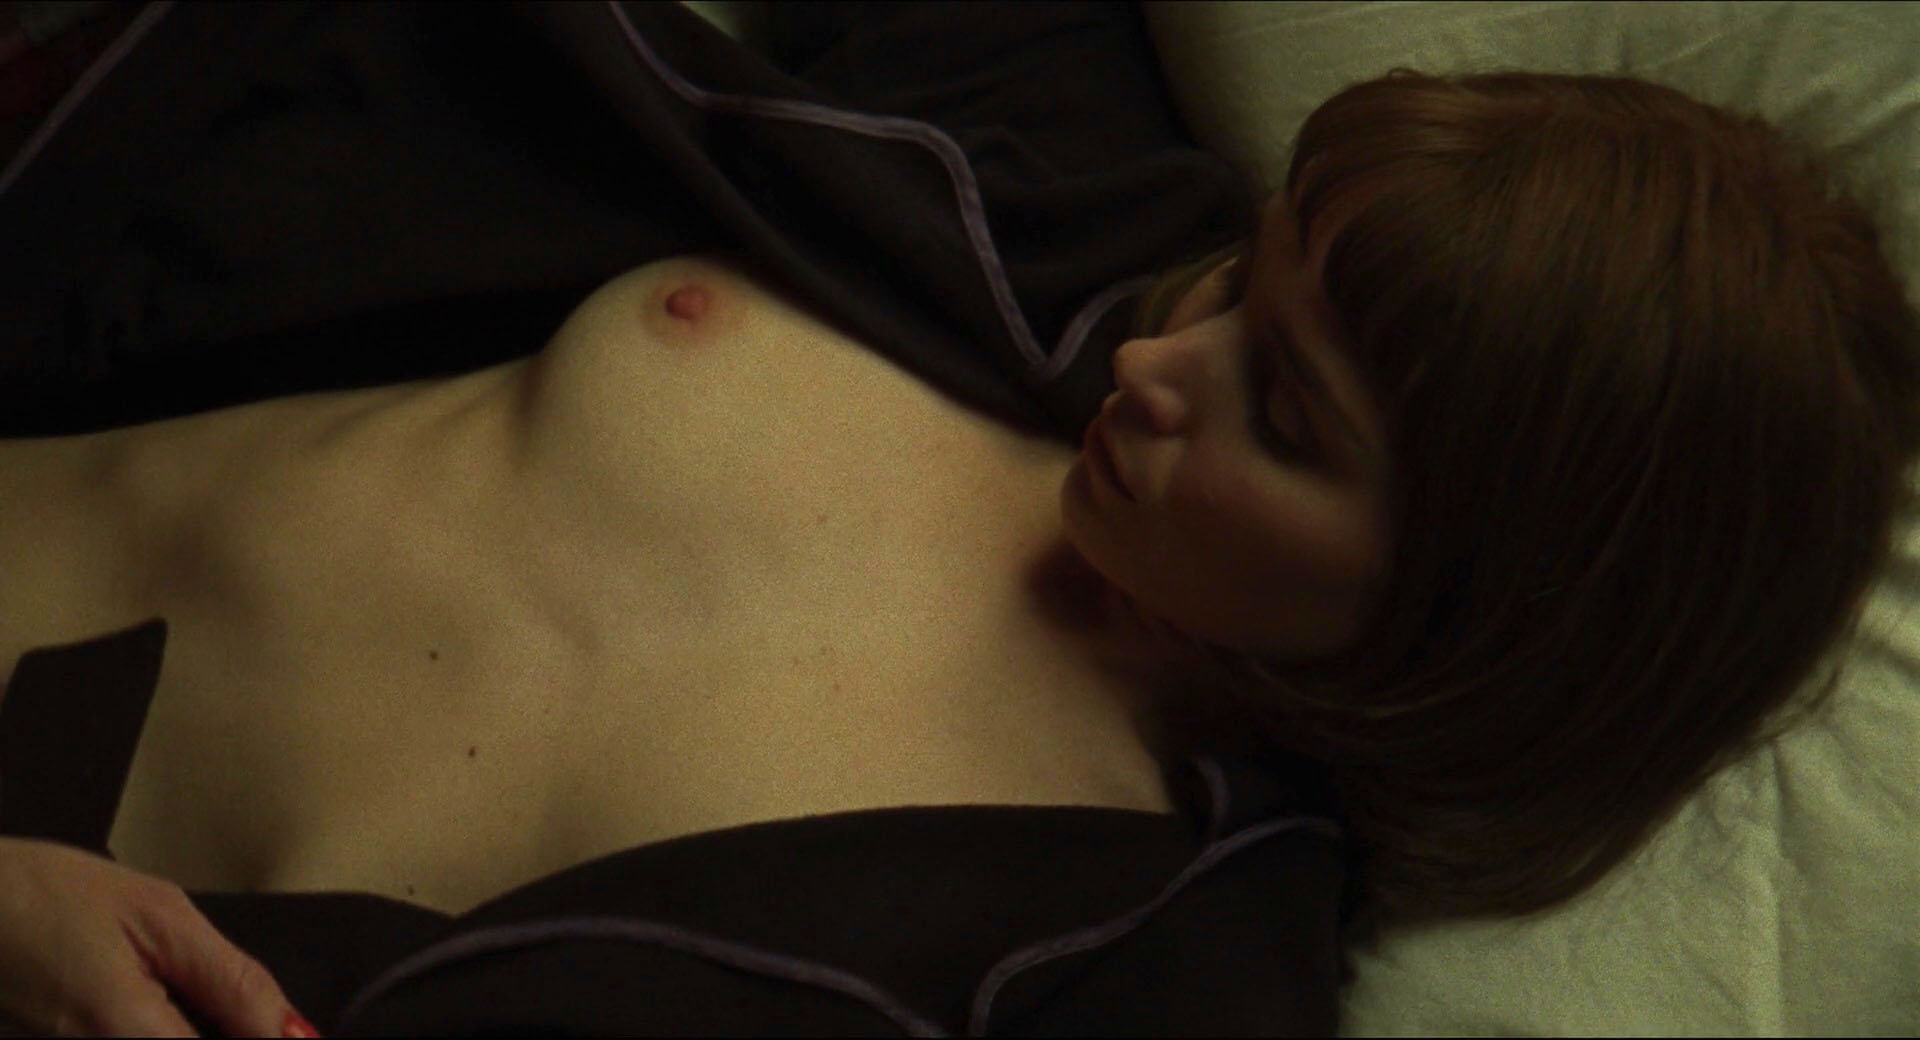 Nuevo Cate Blanchett Sexy Desnuda Fotos